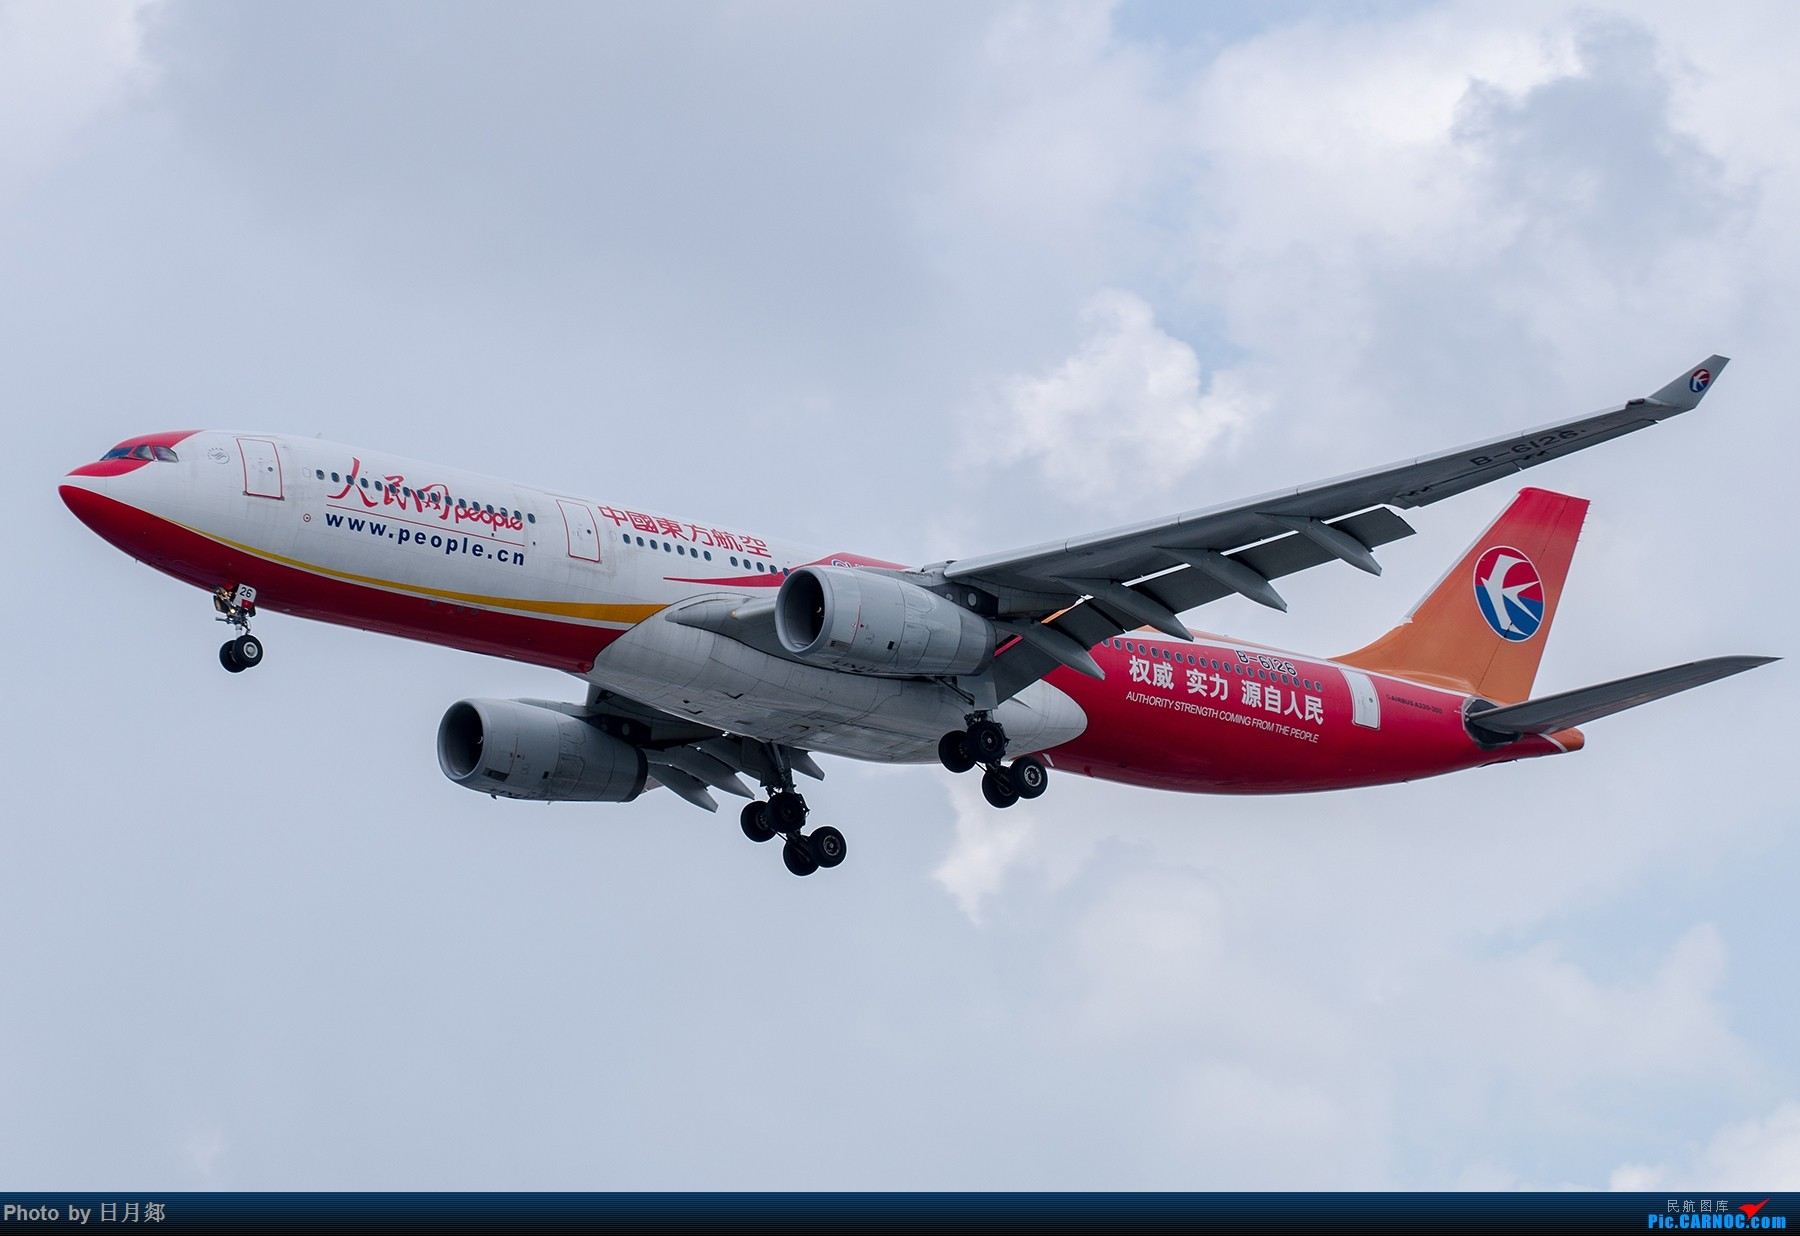 Re:[原创]【SHA拍机*1800大图】图要抓紧发,不然就要炒冷饭,大头镇贴 AIRBUS A330-300 B-6126 中国上海虹桥国际机场